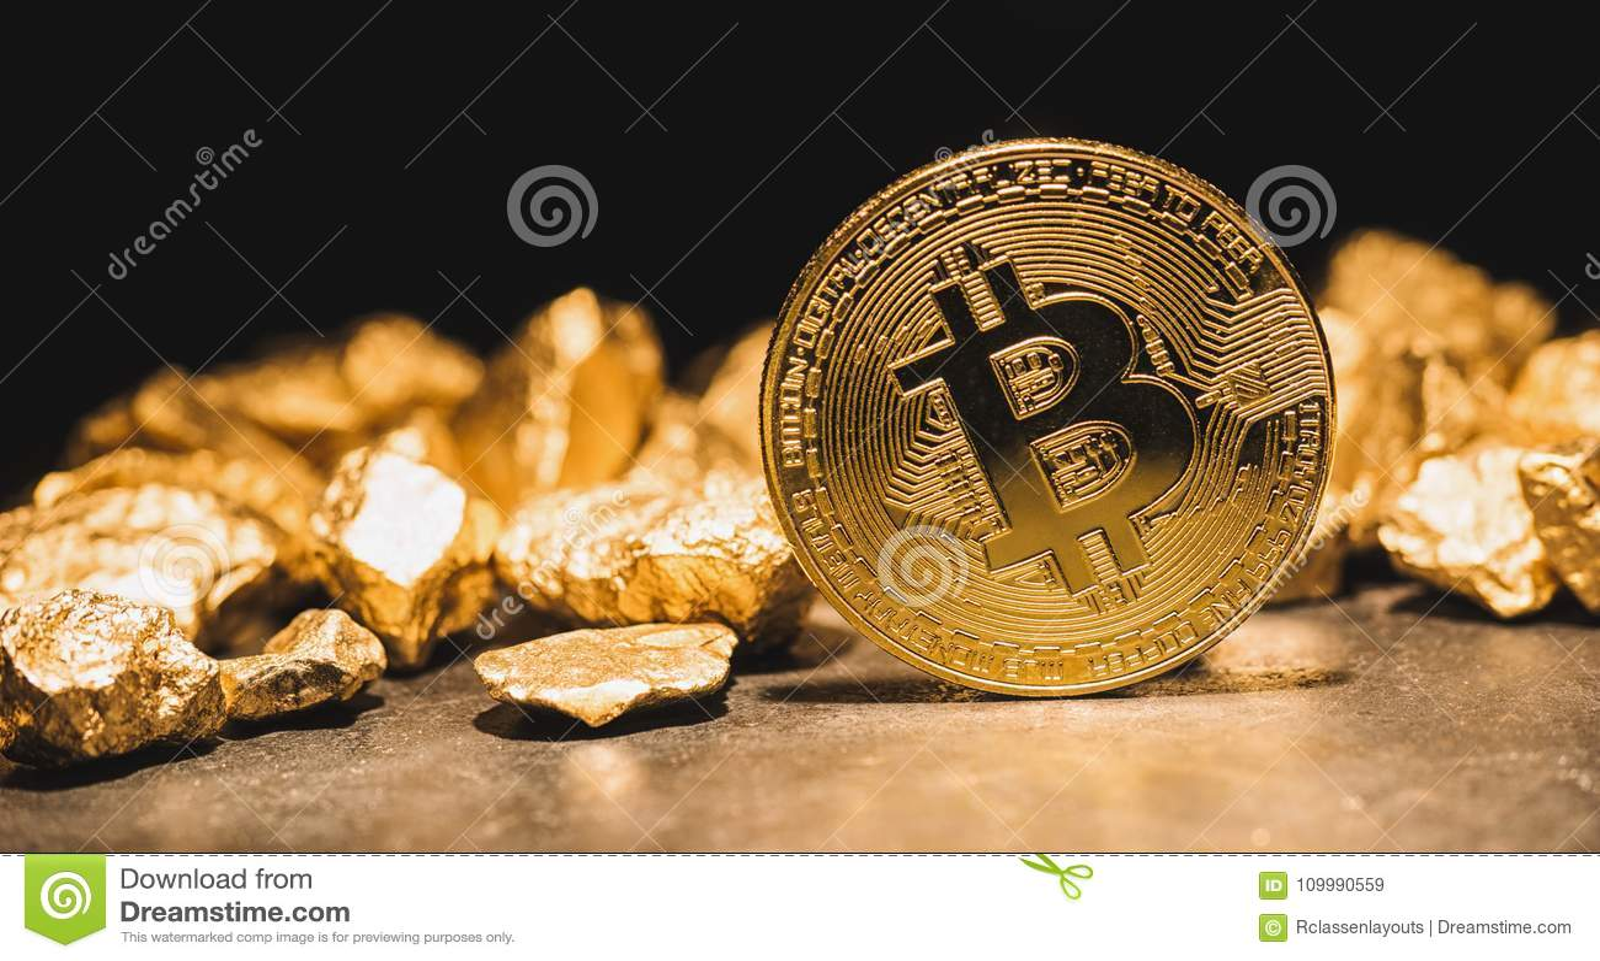 Cryptocurrency块金Bitcoin和土墩-浓缩的事务